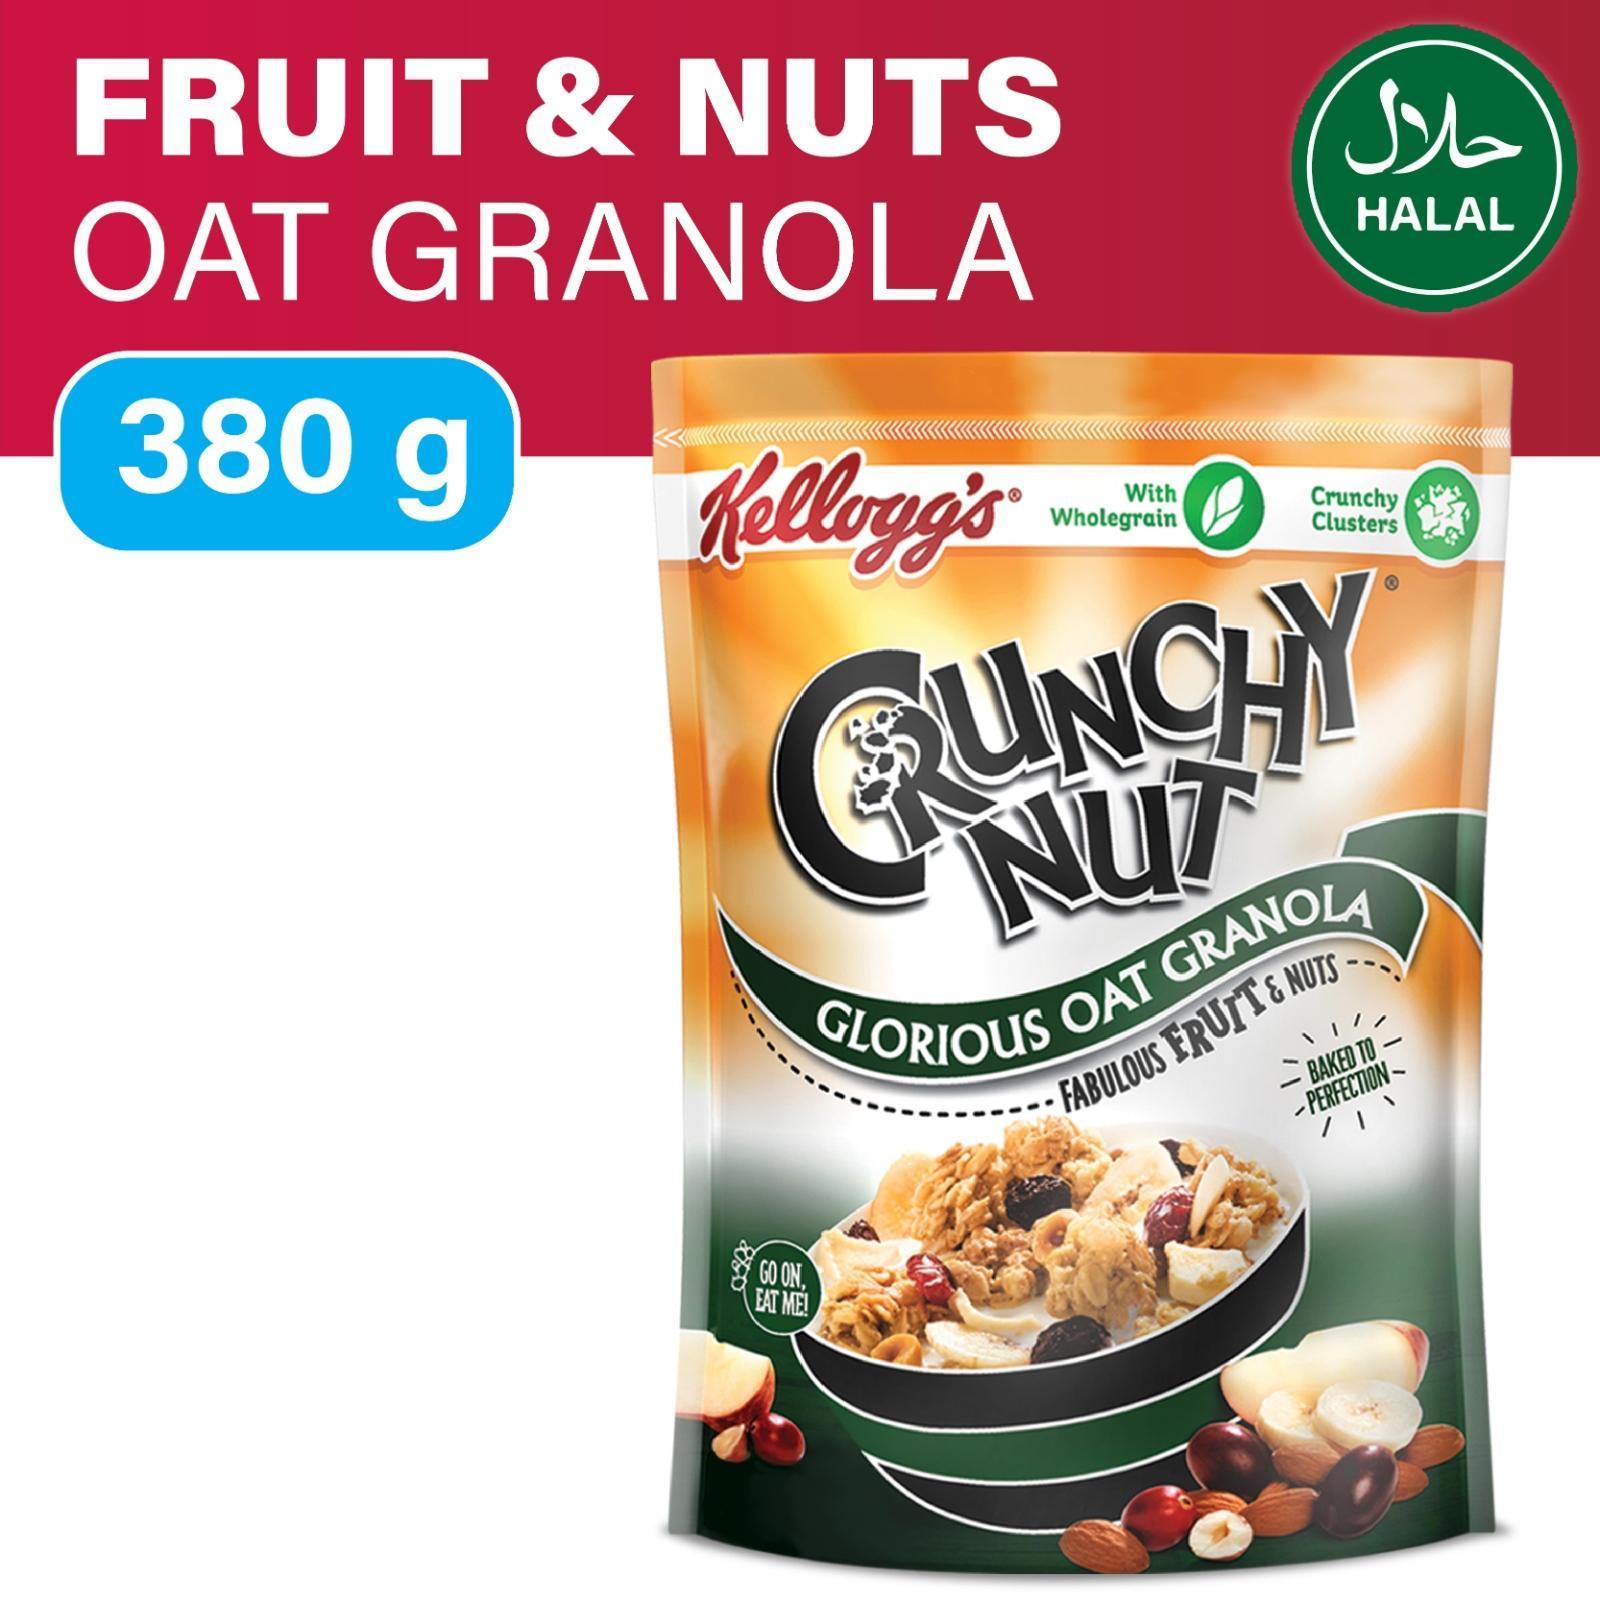 KELLOGG'S Crunchy Nut Oat Granola Fruit&Nuts 380g